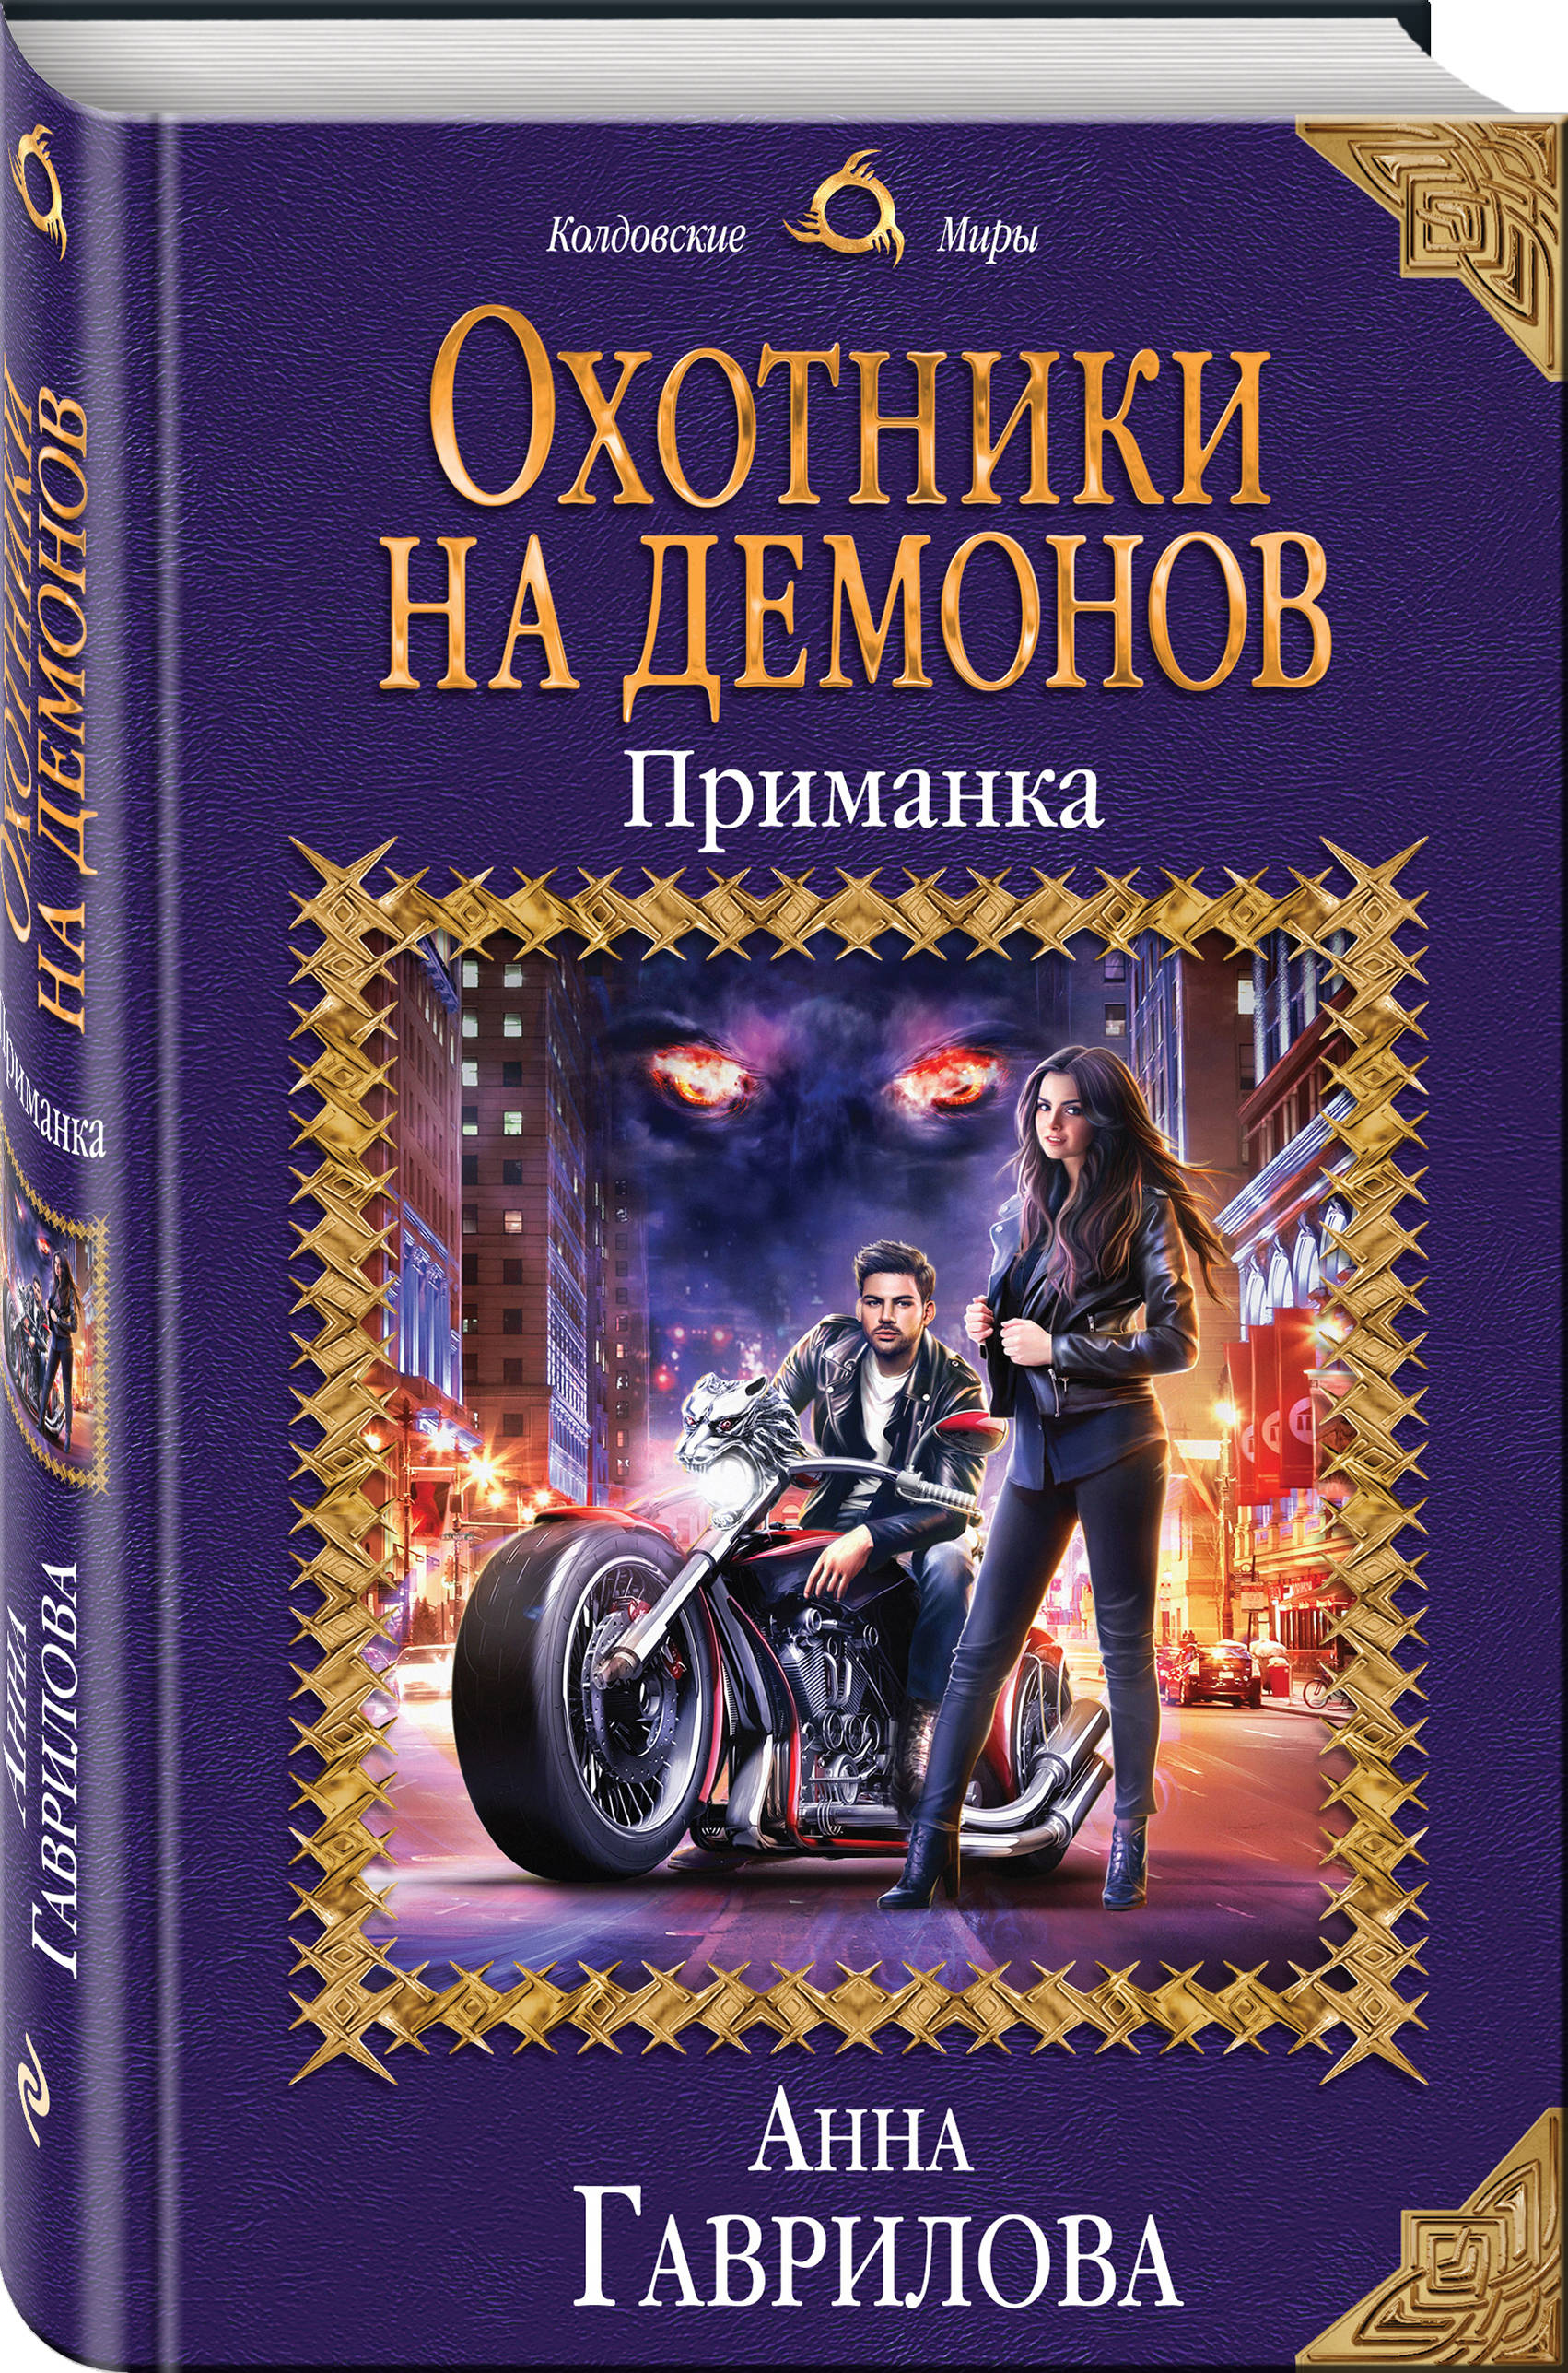 Гаврилова Анна Сергеевна Охотники на демонов. Приманка